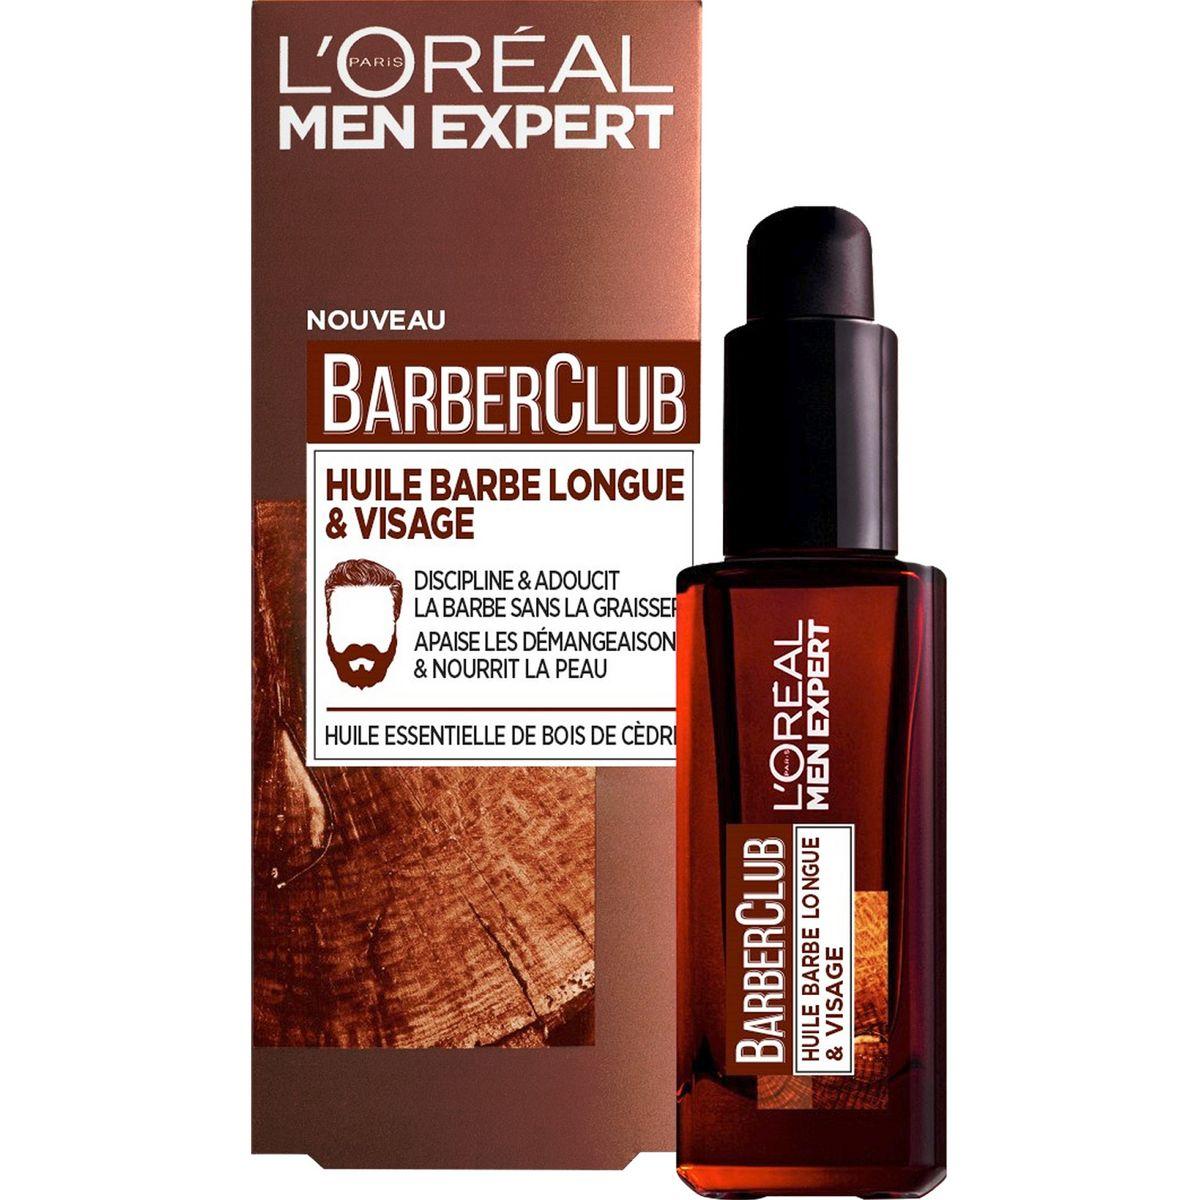 L'Oréal Barber Club huile barbe longue & visage 30ml